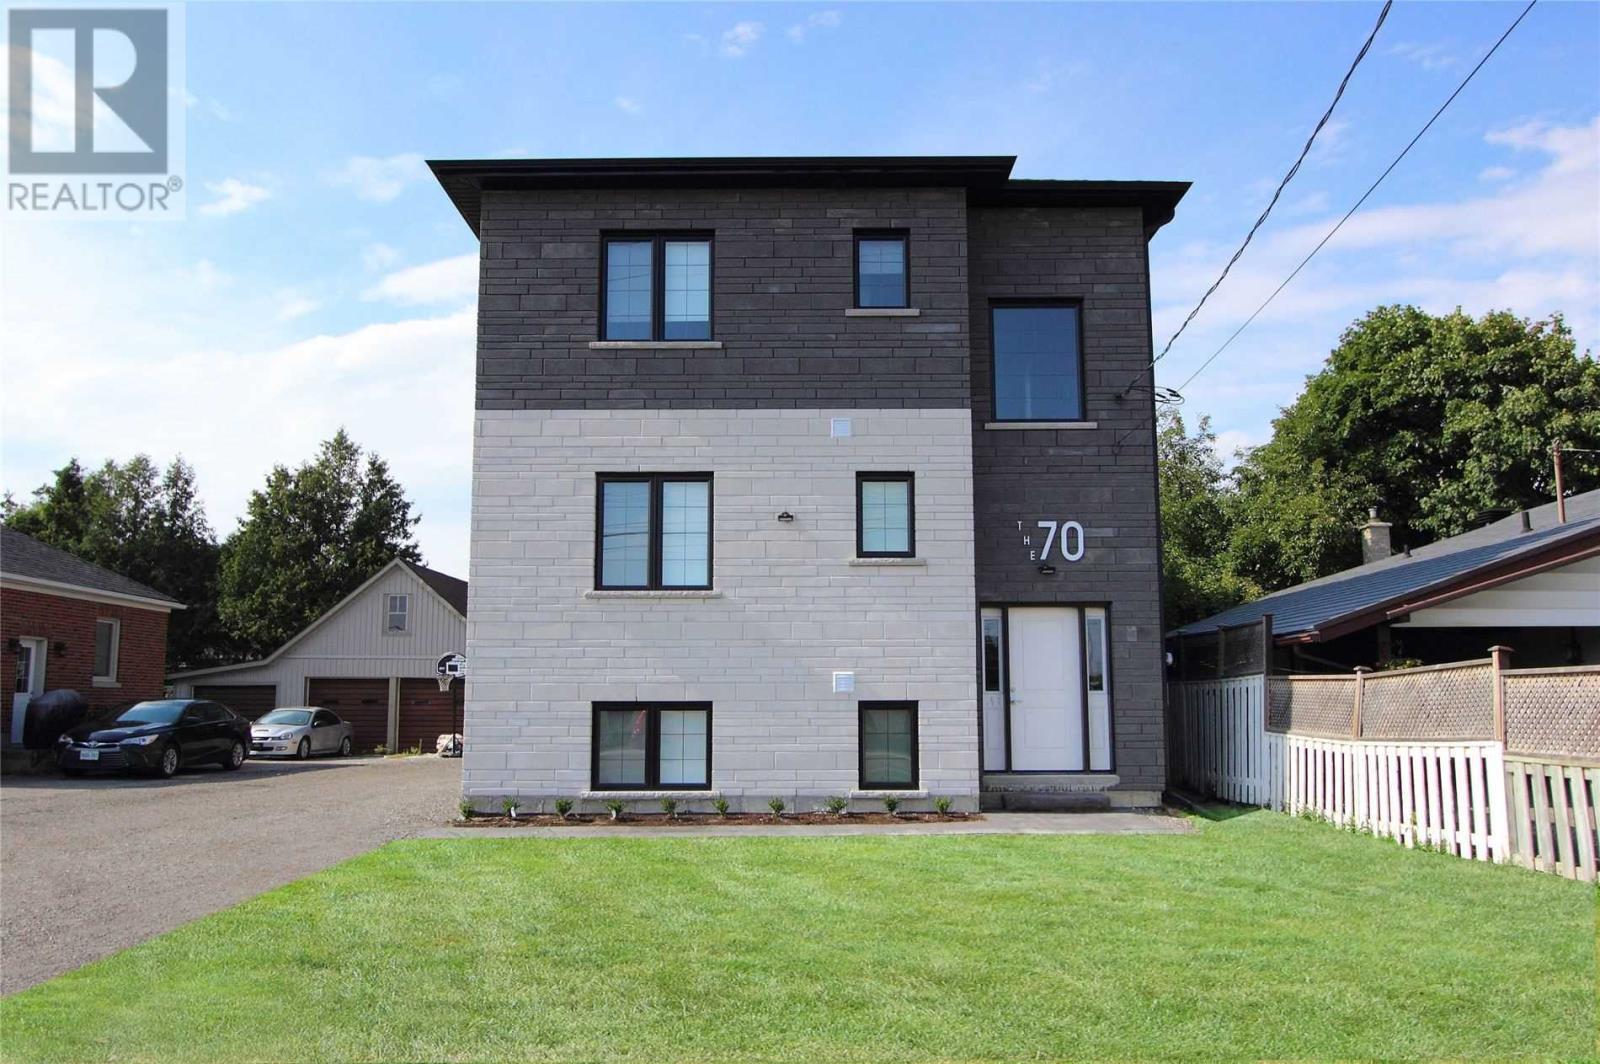 #1 -70 TAUNTON RD W, oshawa, Ontario